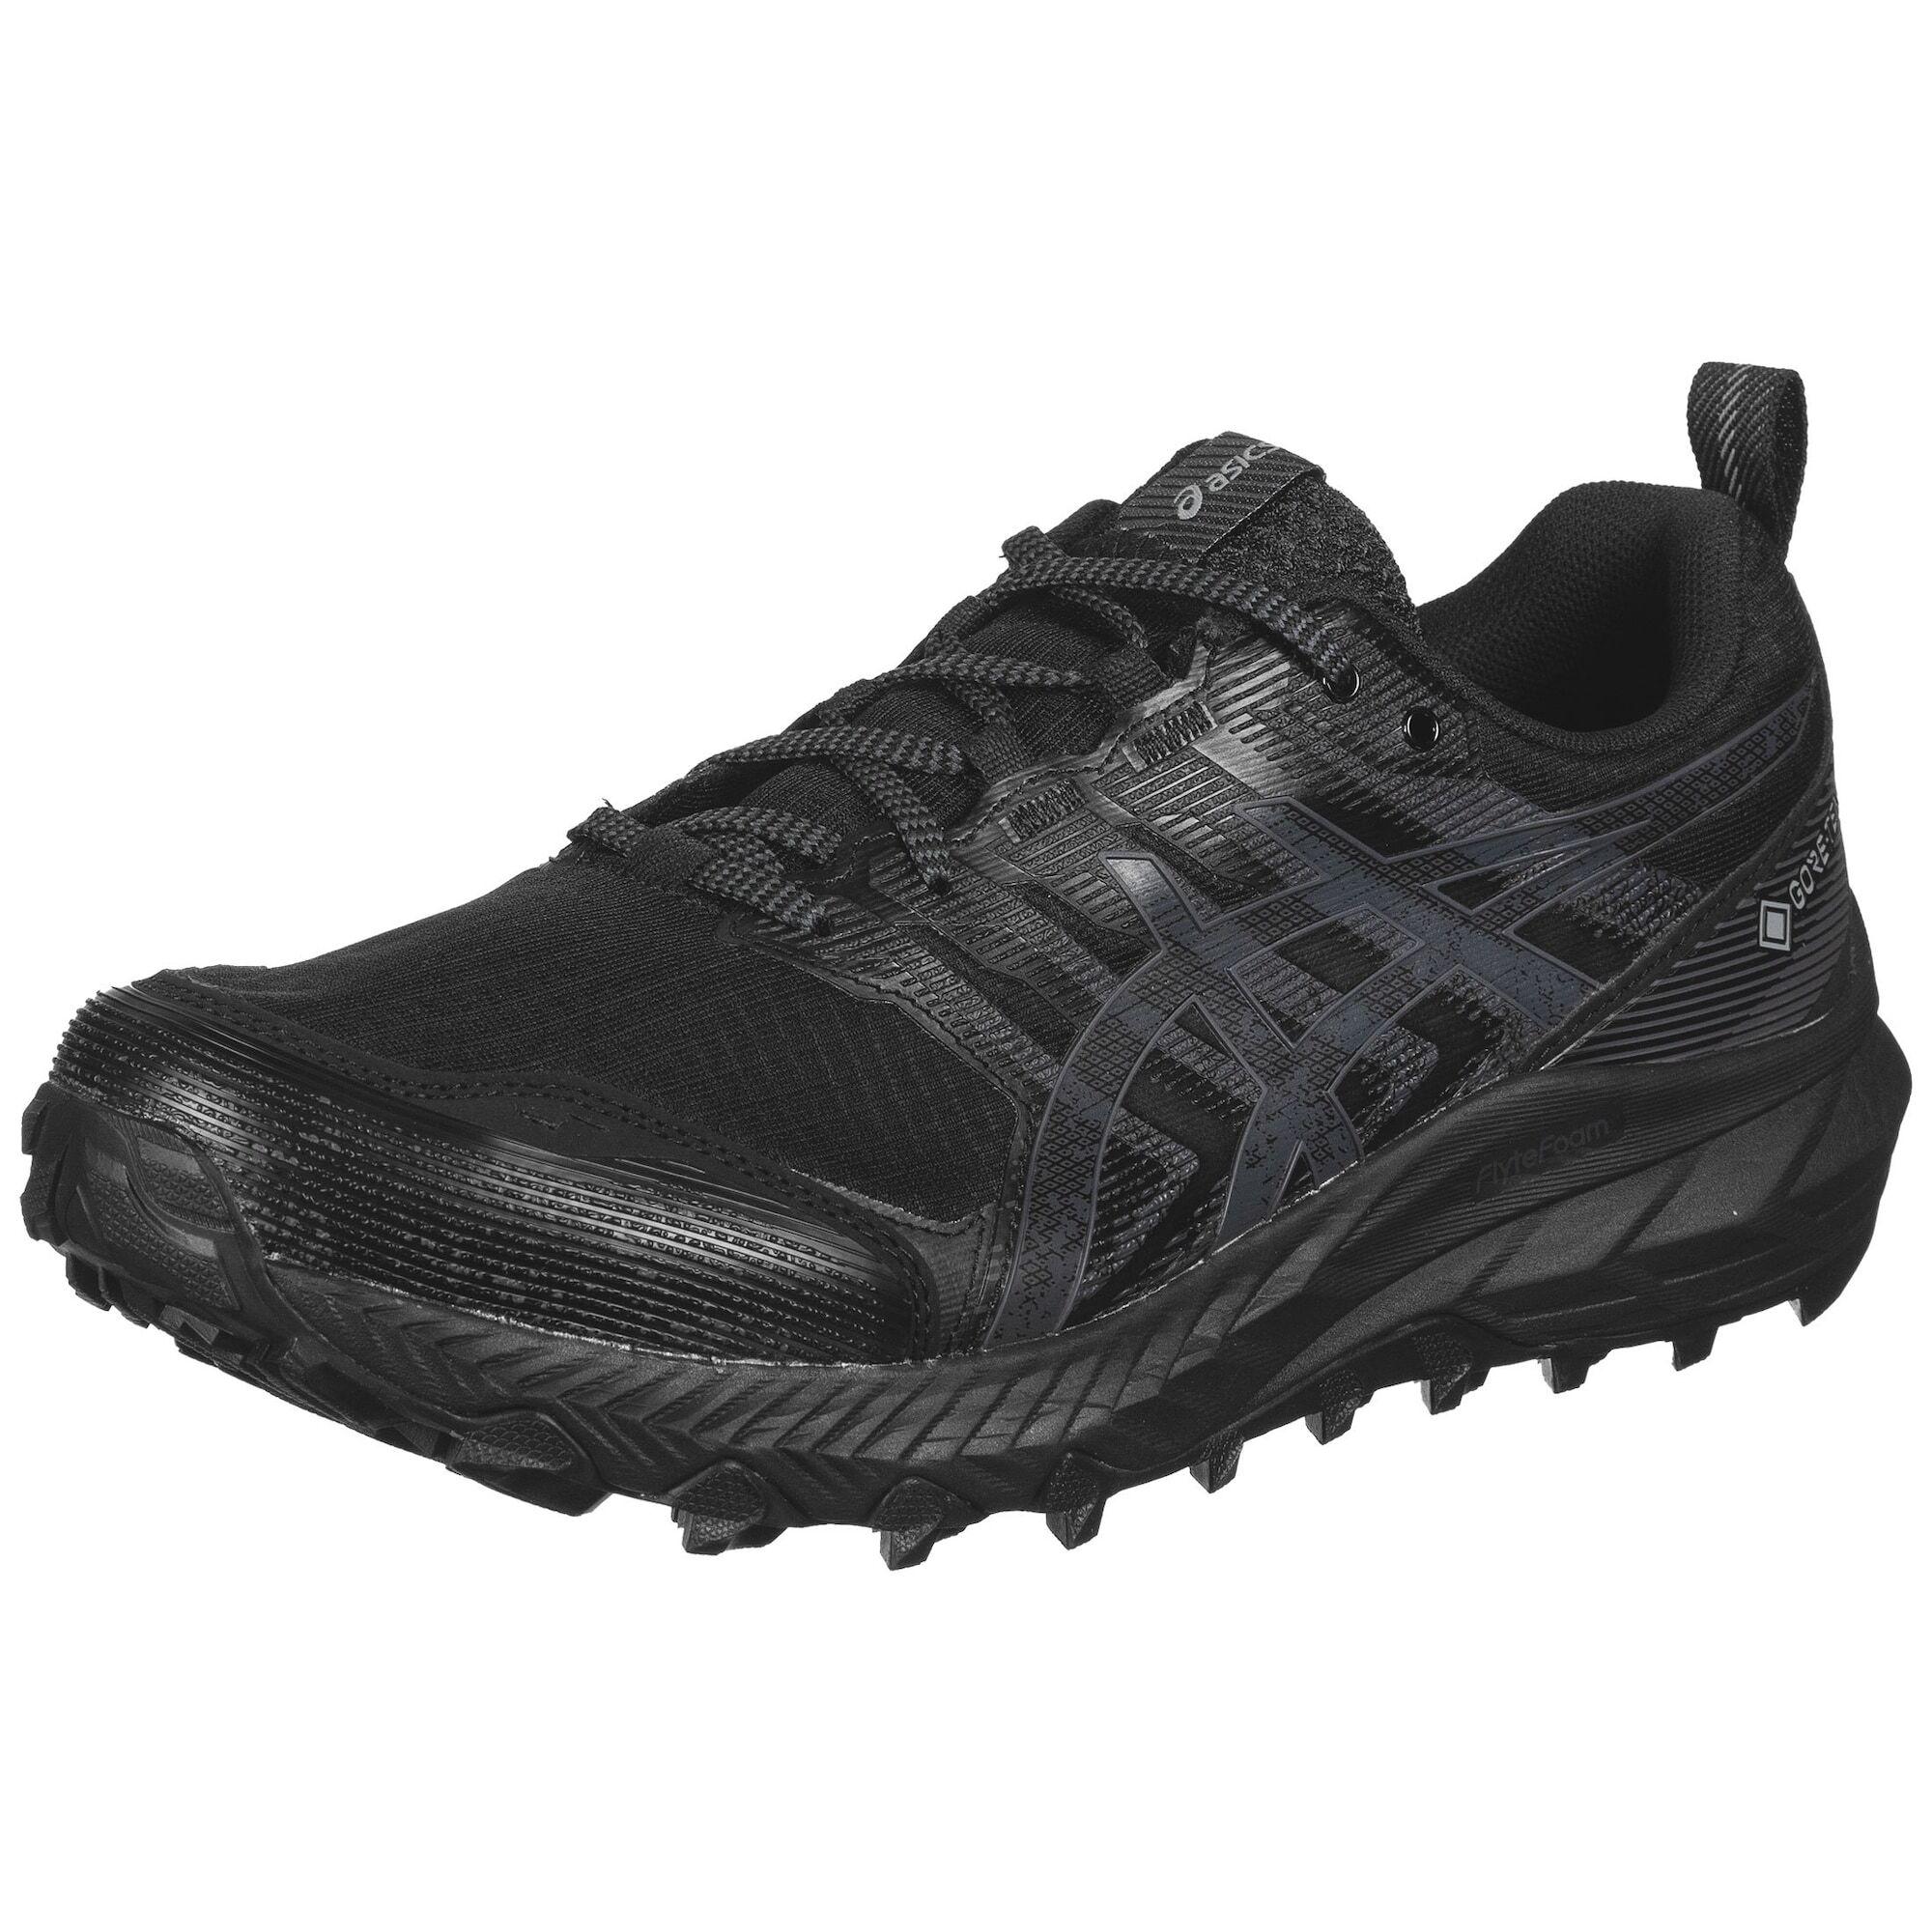 Asics Chaussure de course ' Fujitrabuco 09 G-TX '  - Noir - Taille: 46 - male